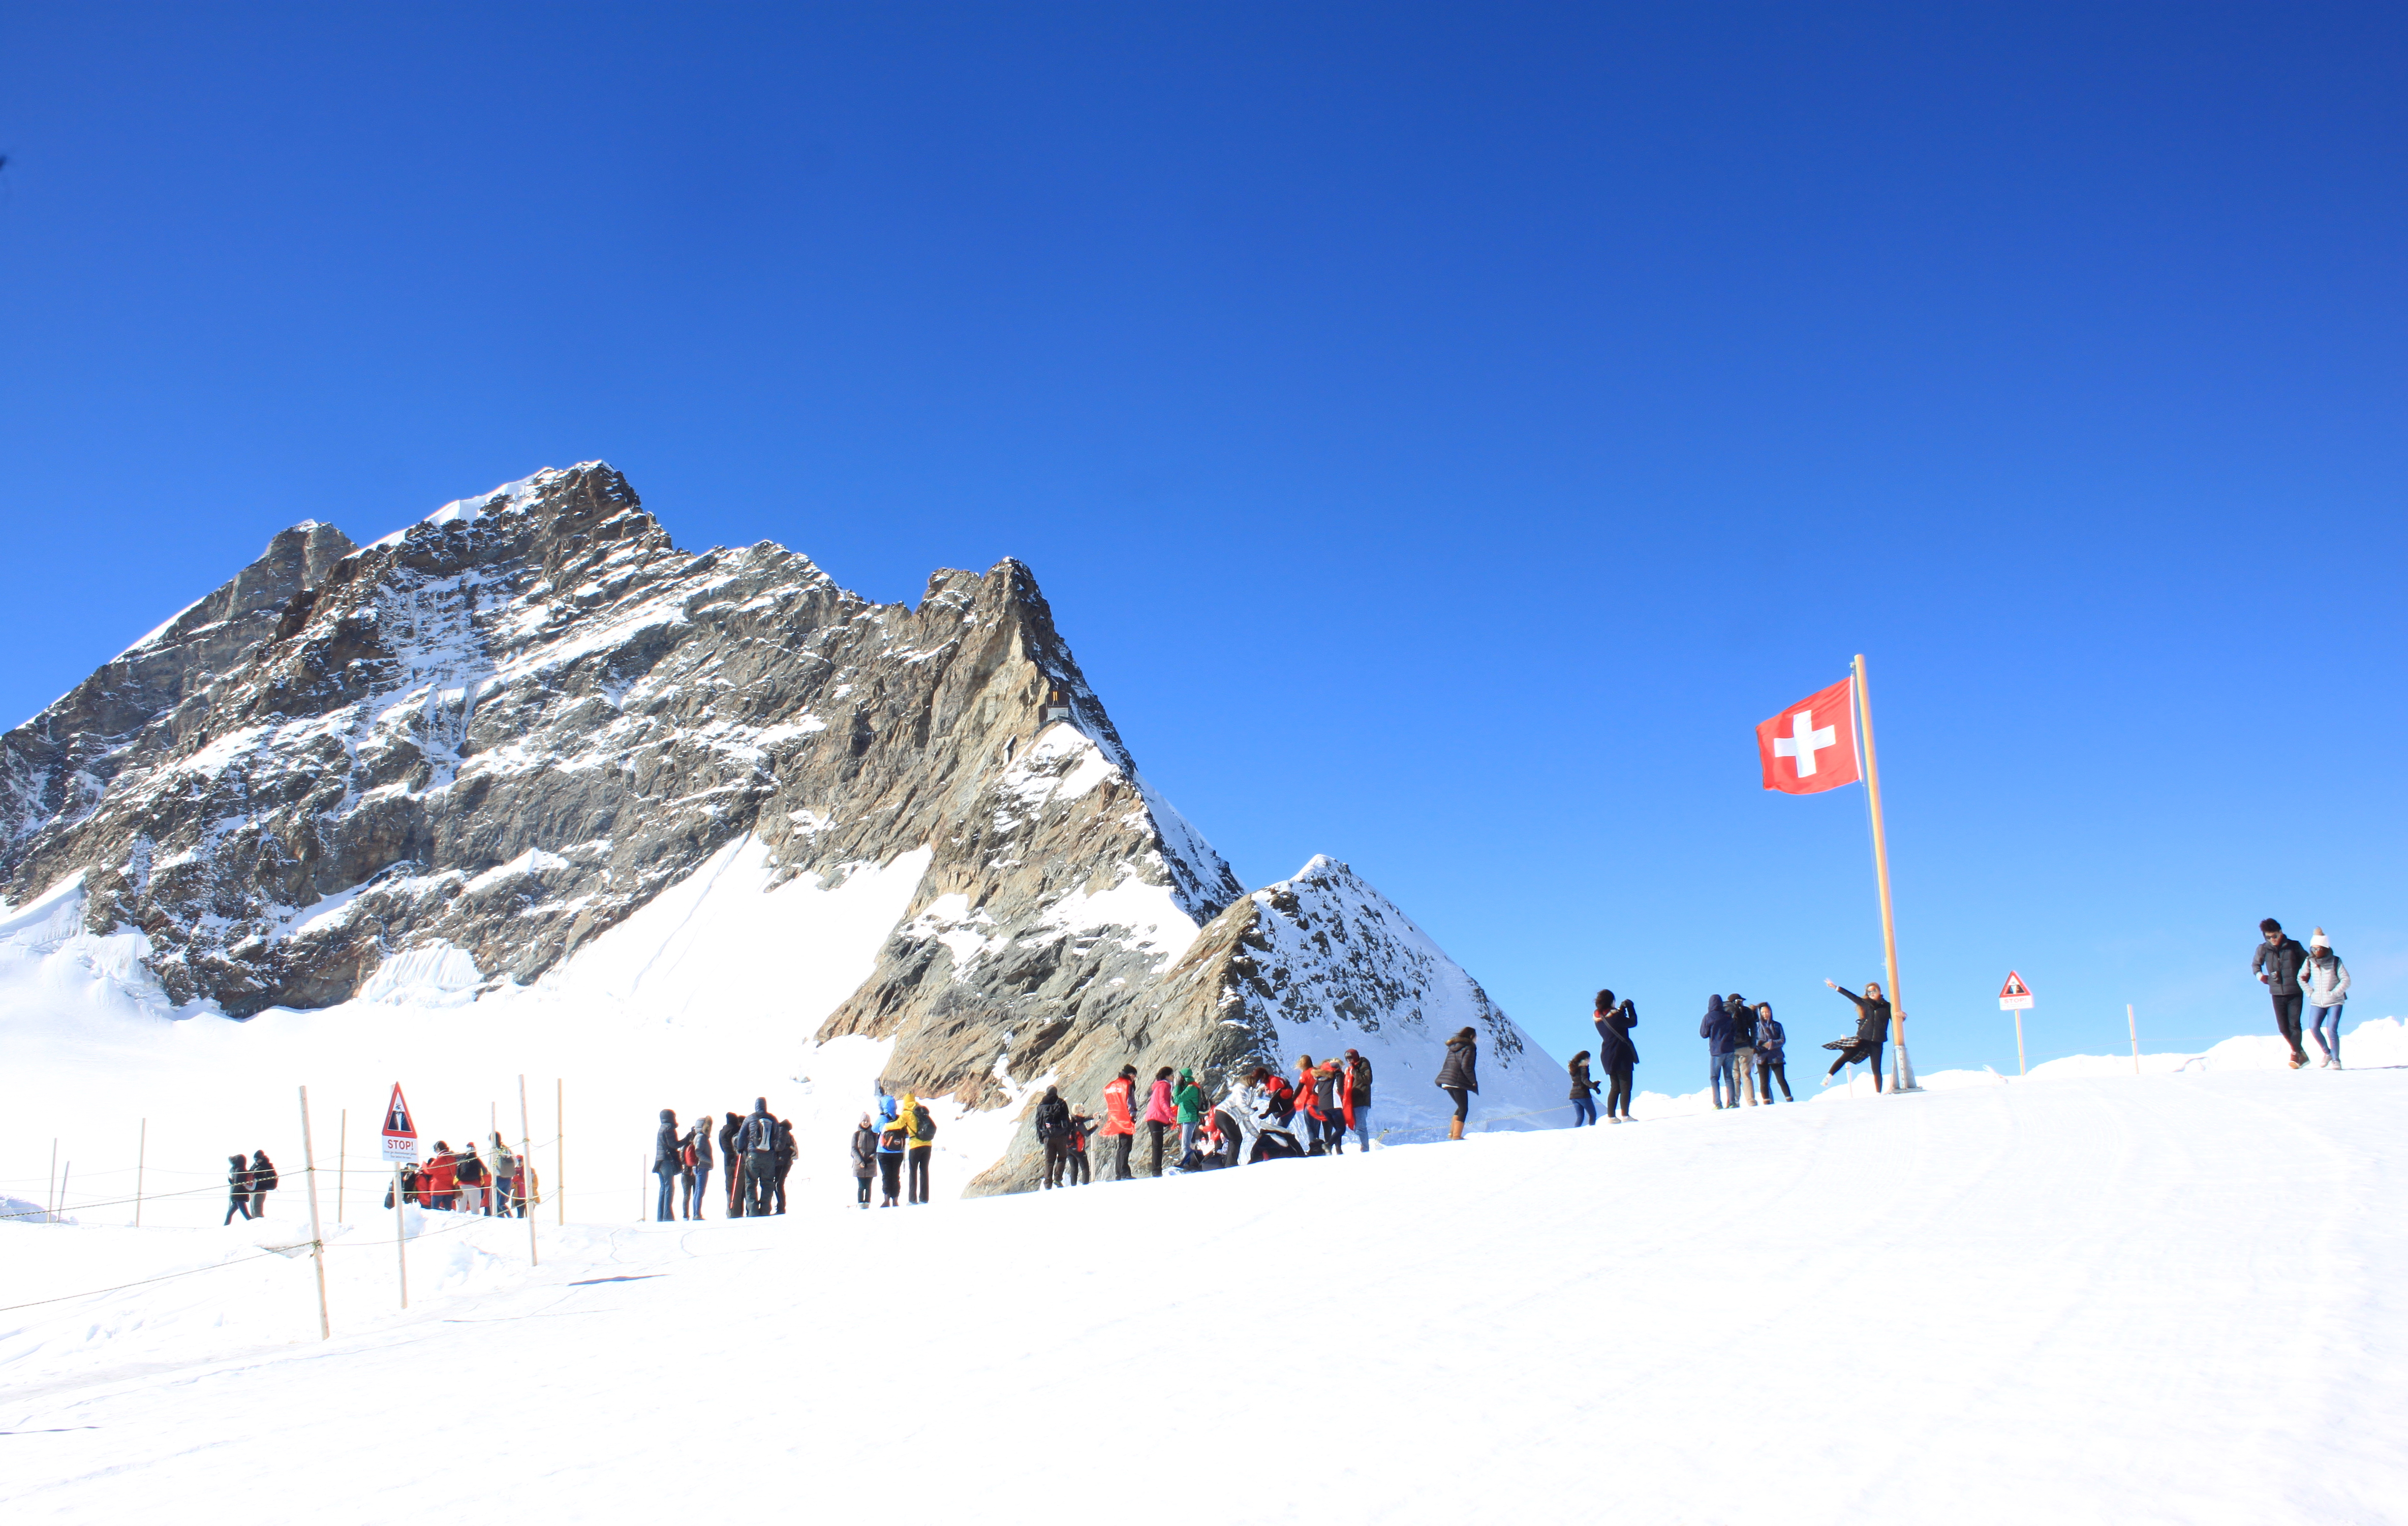 Switzerland, Interlaken to Jungfraujoch The Top of Europe on a Budget Trip